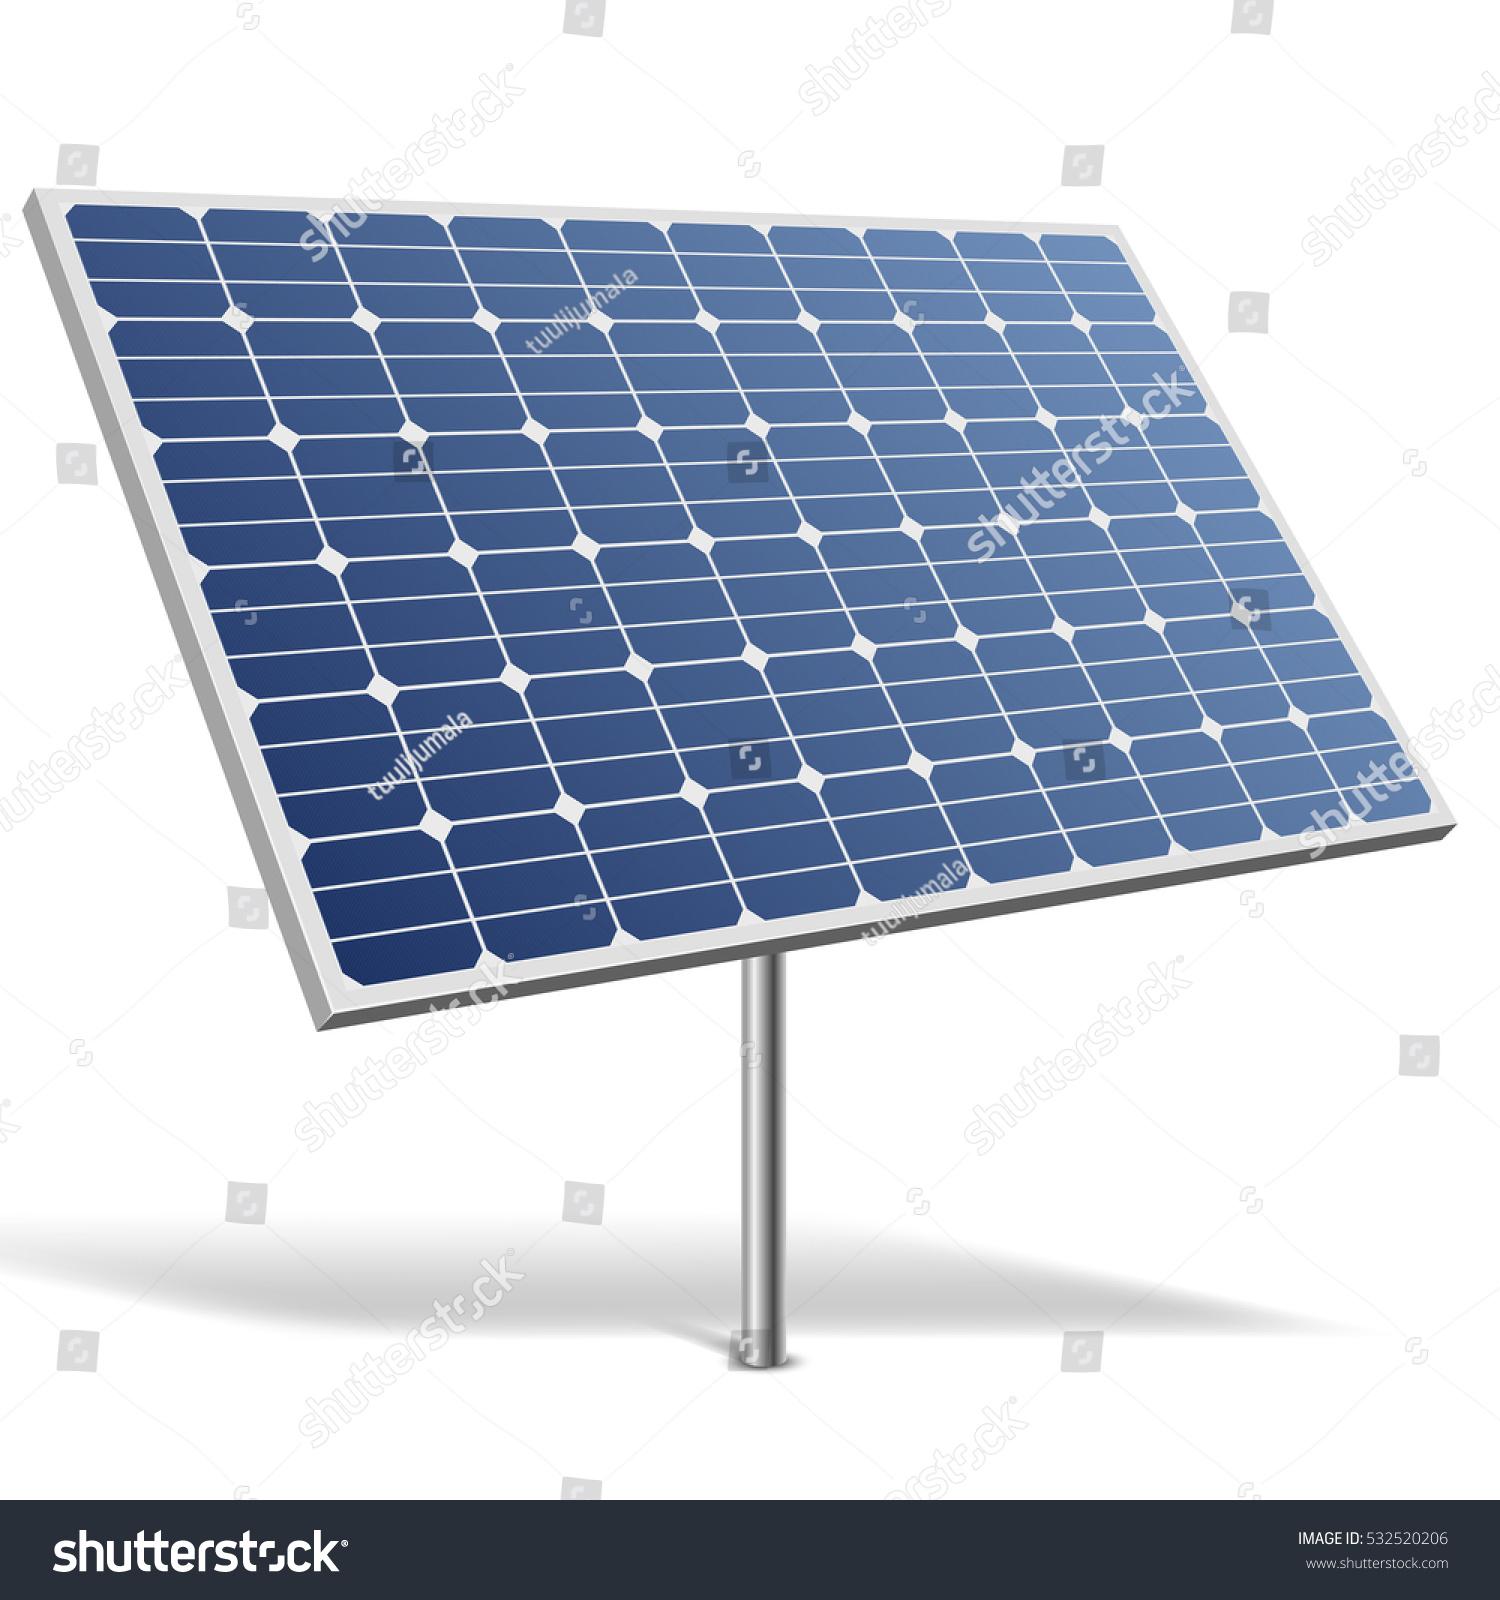 solar panel background - photo #34